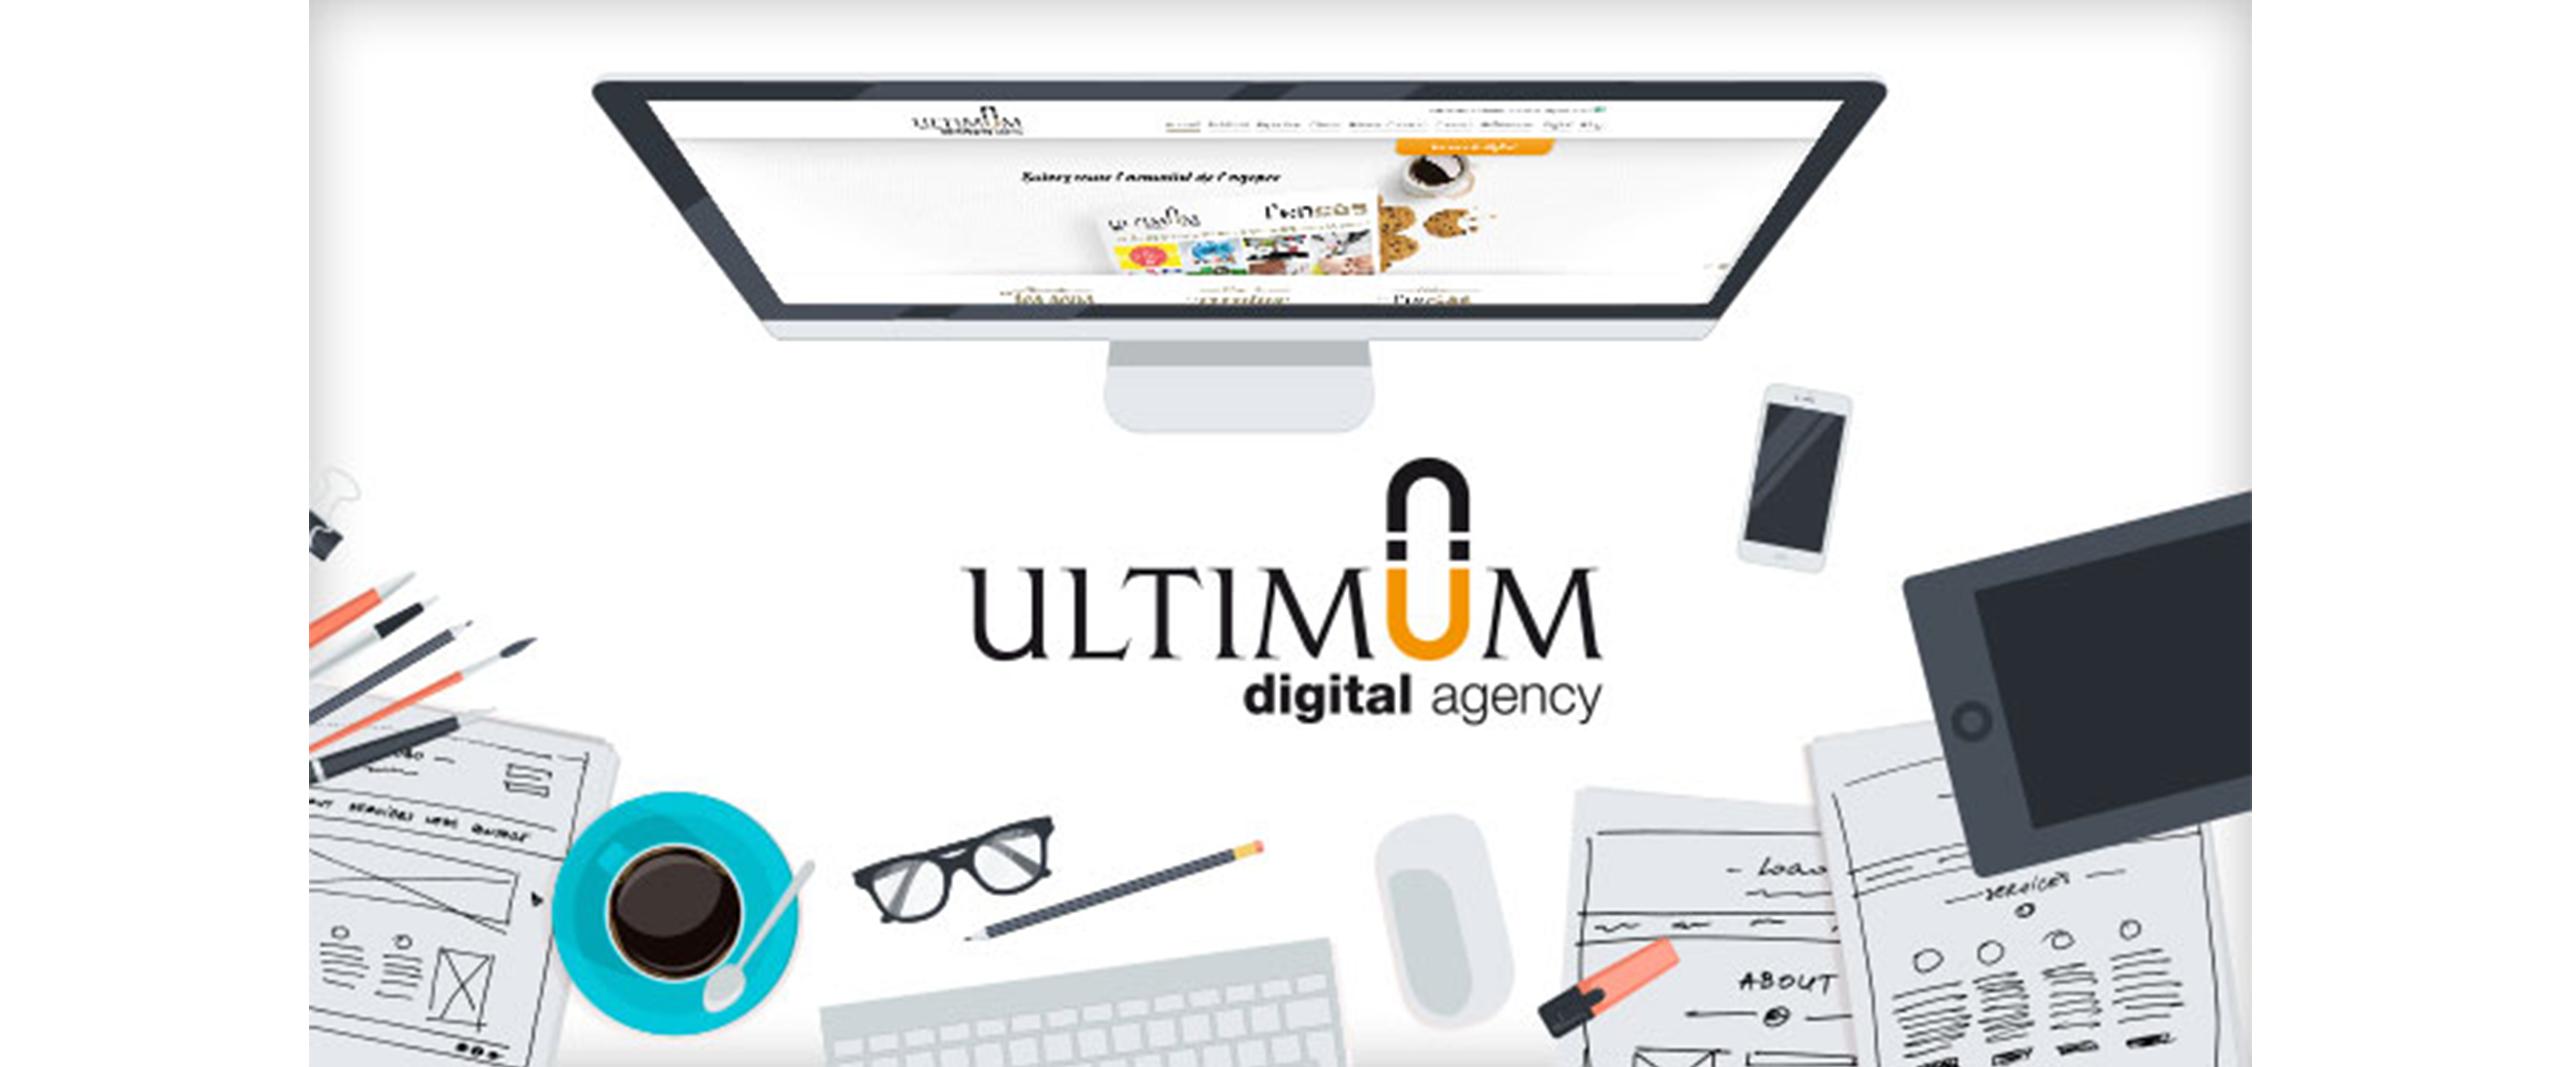 ultimum-digital